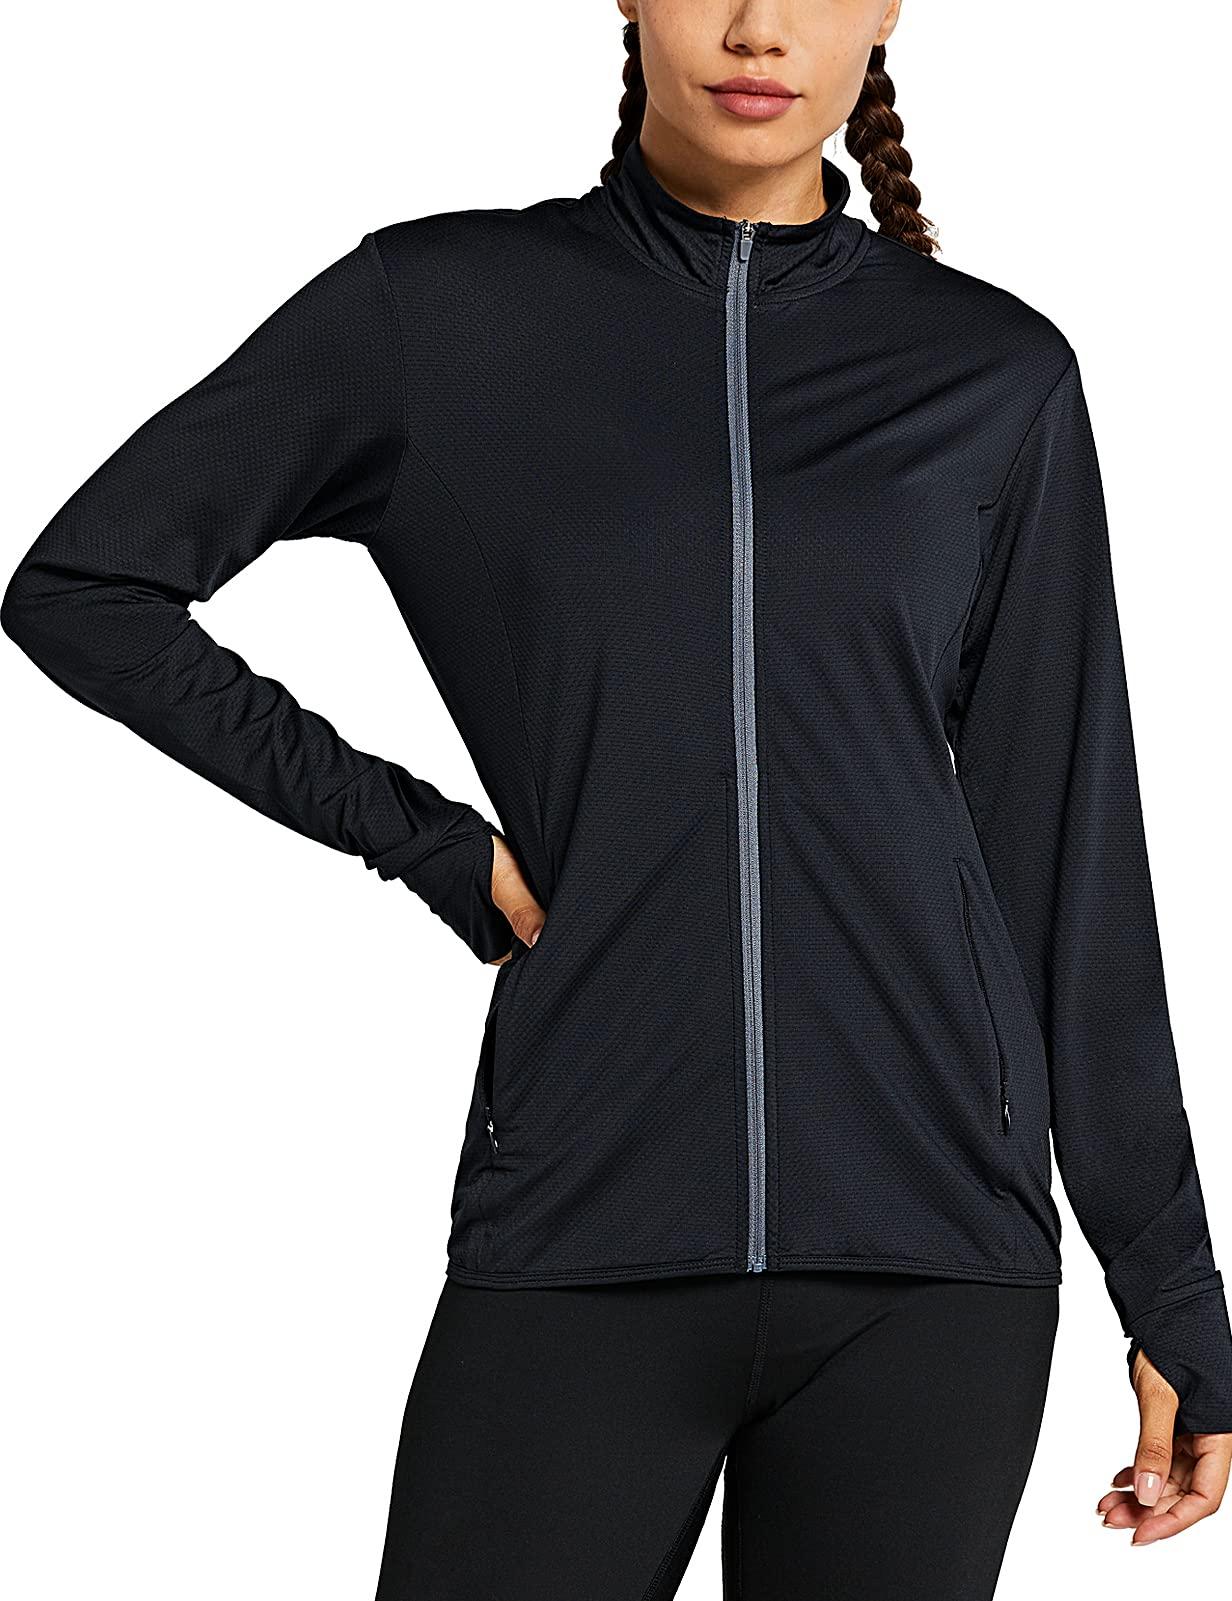 ZUTY UPF 50+ UV Long Sleeve Shirt Women Golf Sun Protection Light